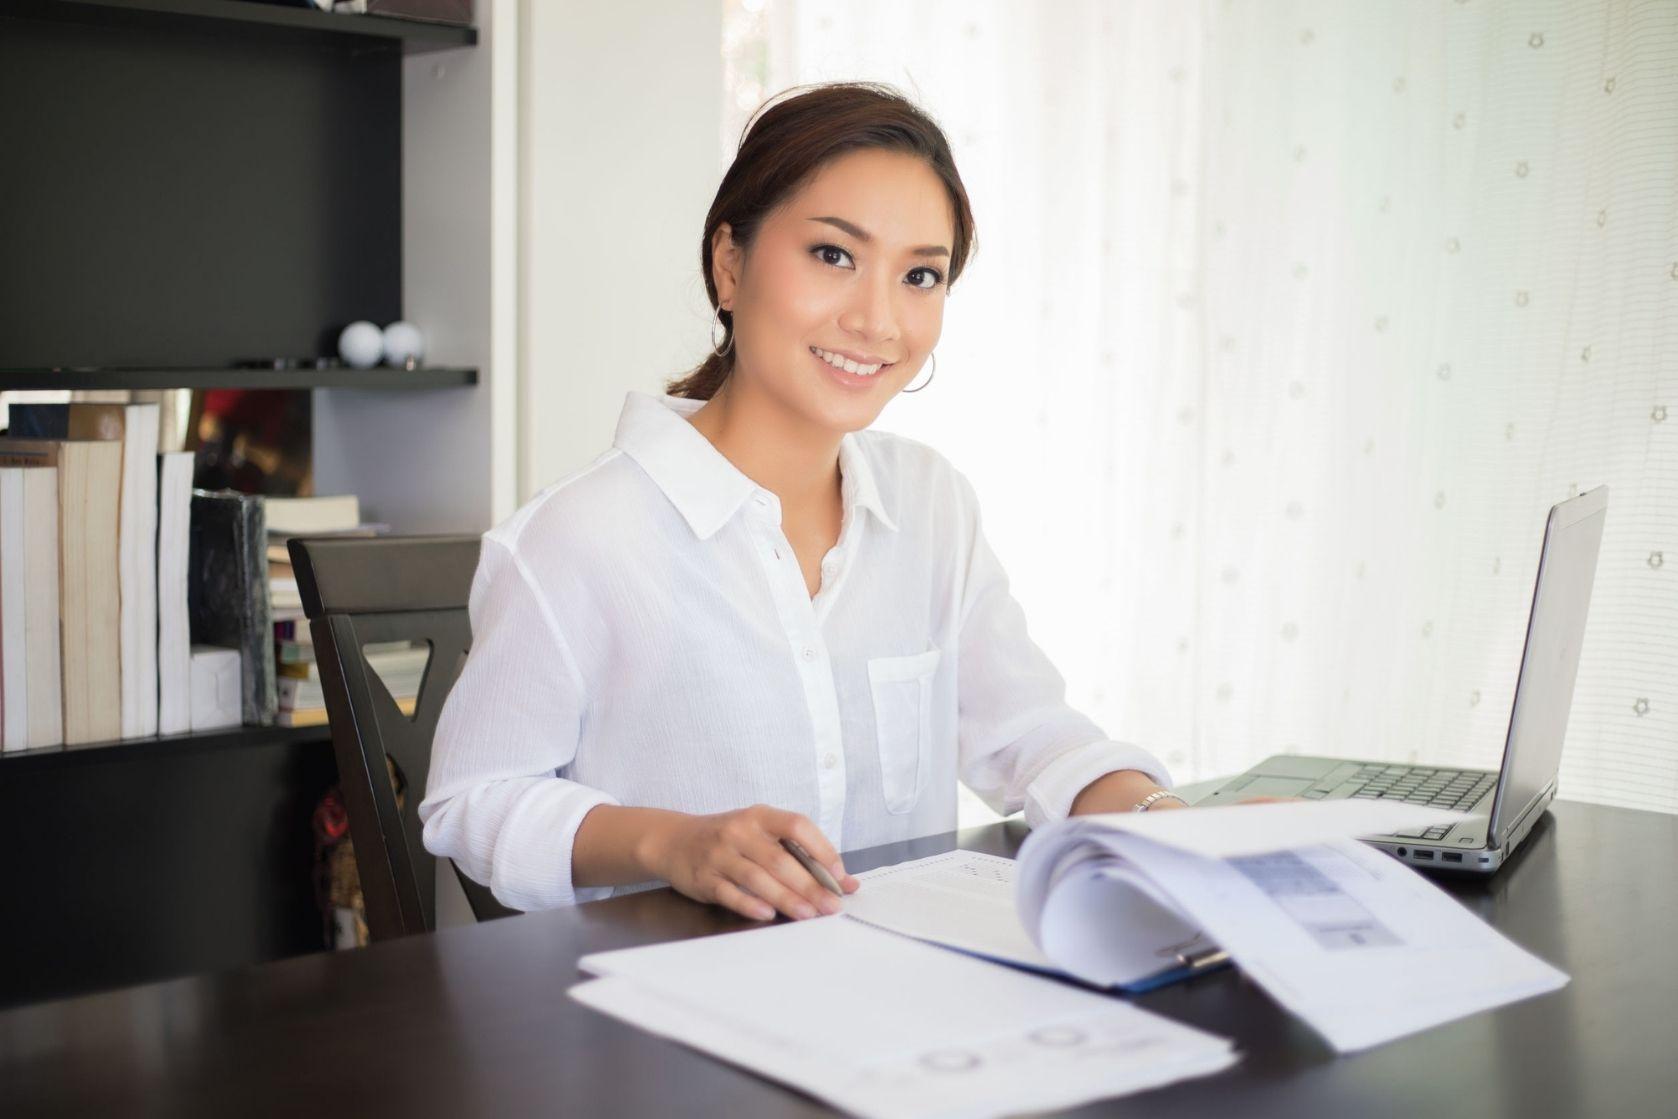 Resume Templates Australia, Accounting Resume, Bookkeeper Resume